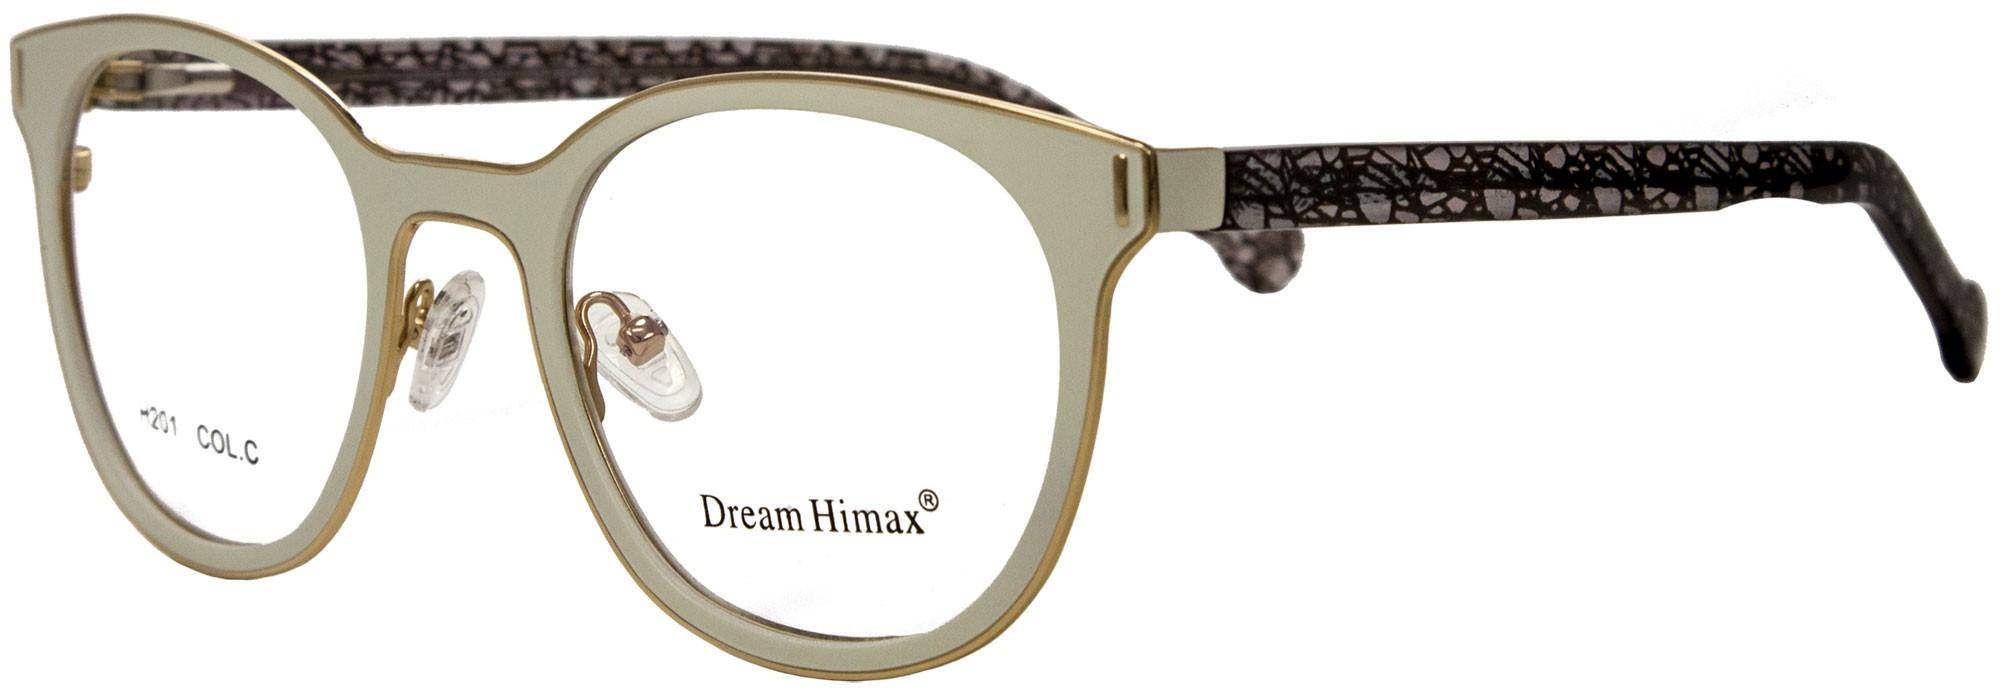 Dream Himax H201 C 2